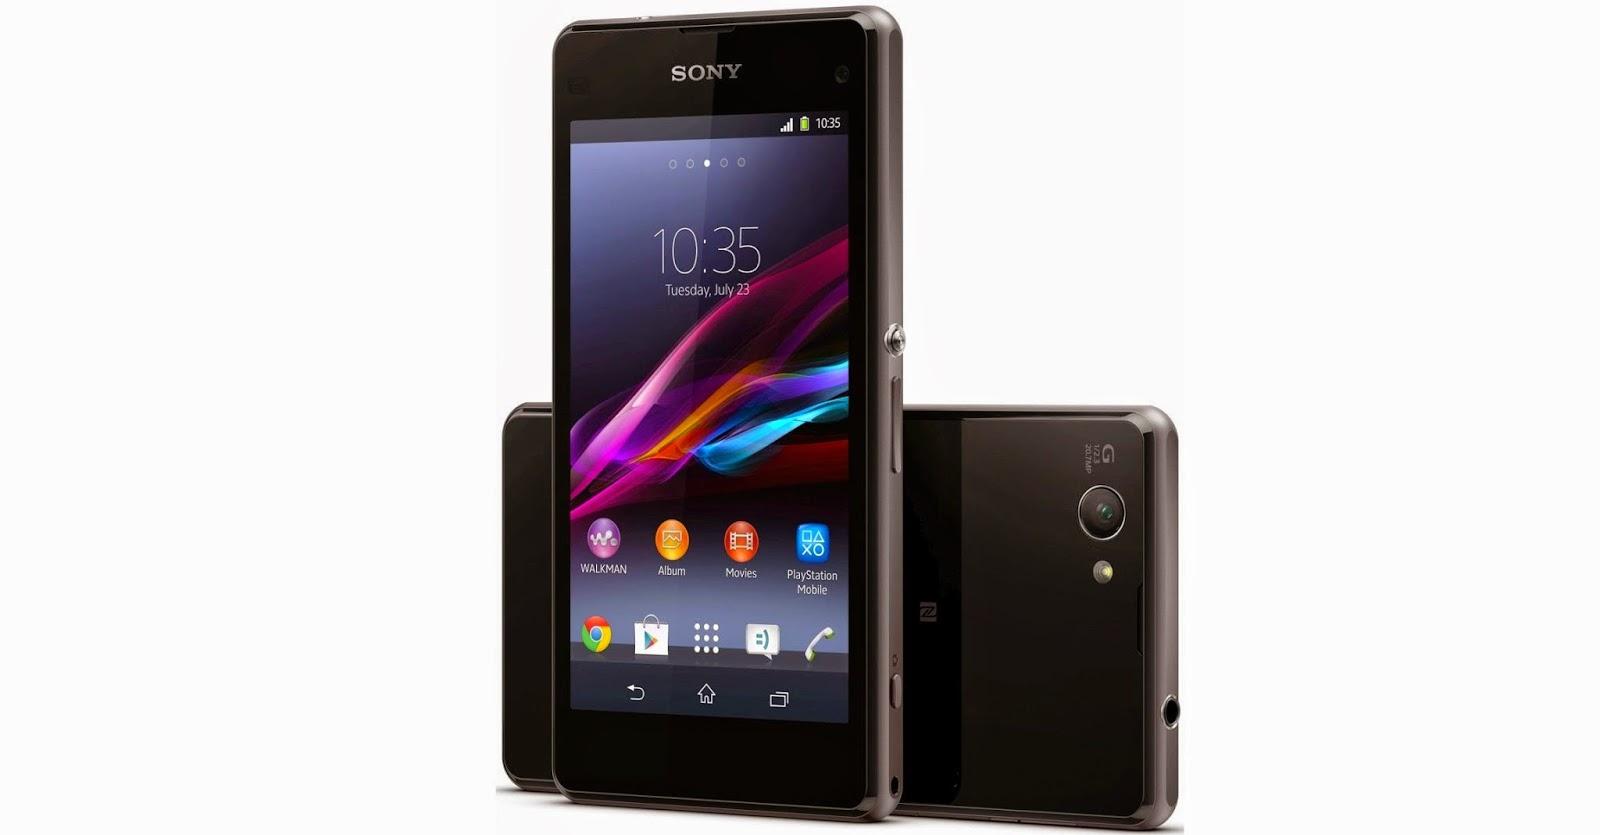 Sony Xperia Z4 dilancarkan secara rasmi